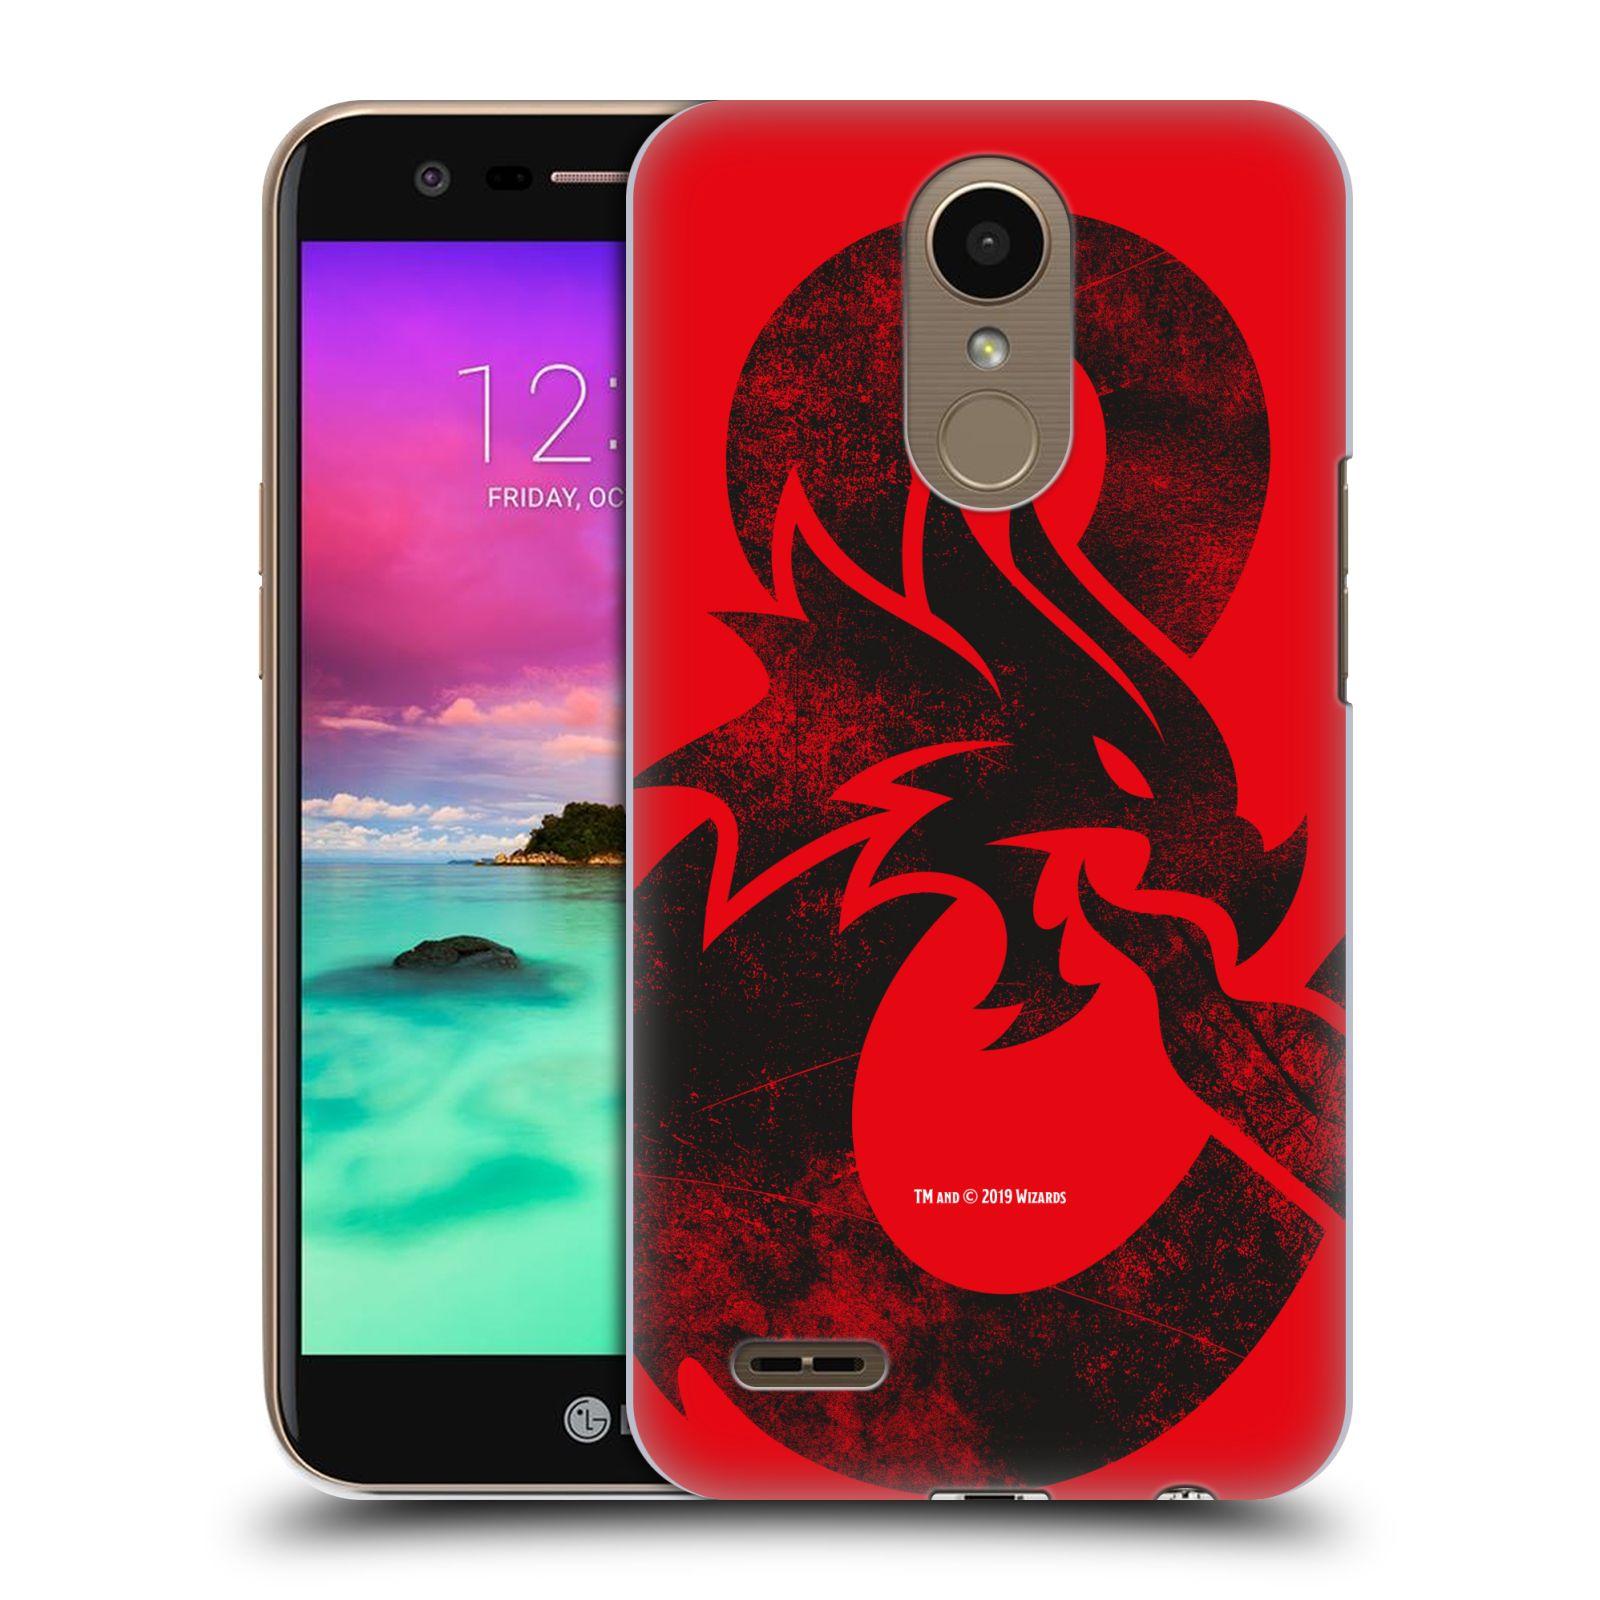 Pouzdro na mobil LG K10 2017 / K10 2017 DUAL SIM - HEAD CASE - Dungeons and Dragons - Chrlící drak